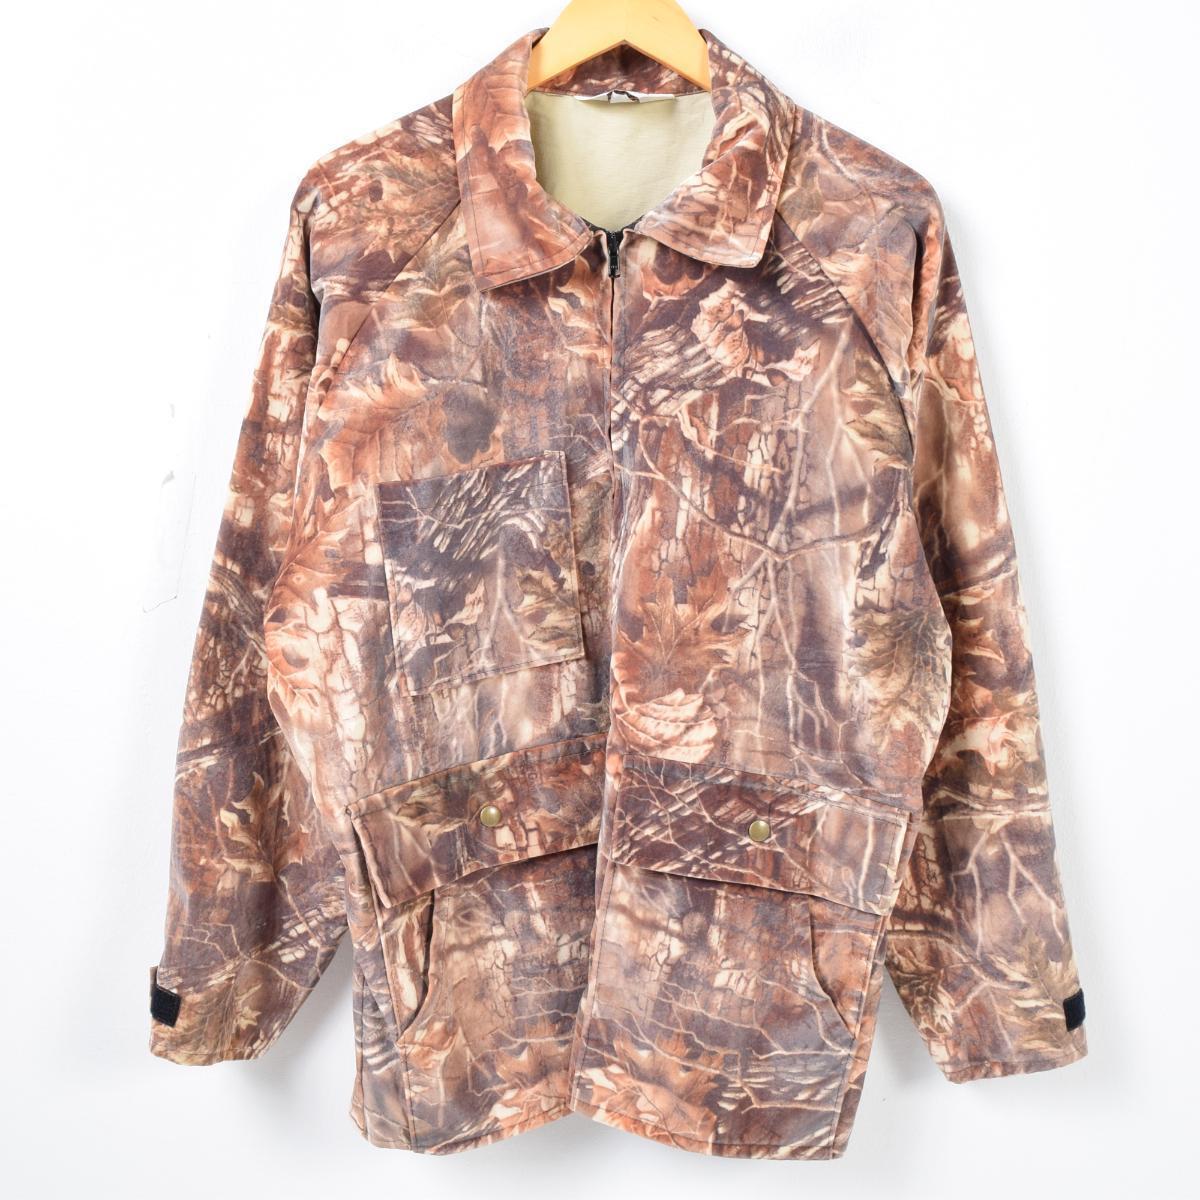 USA製 リアルツリーカモ ハンティングジャケット メンズL Clarkfield OUTDOORS /waj6214 【中古】 【171024】【SS1903】